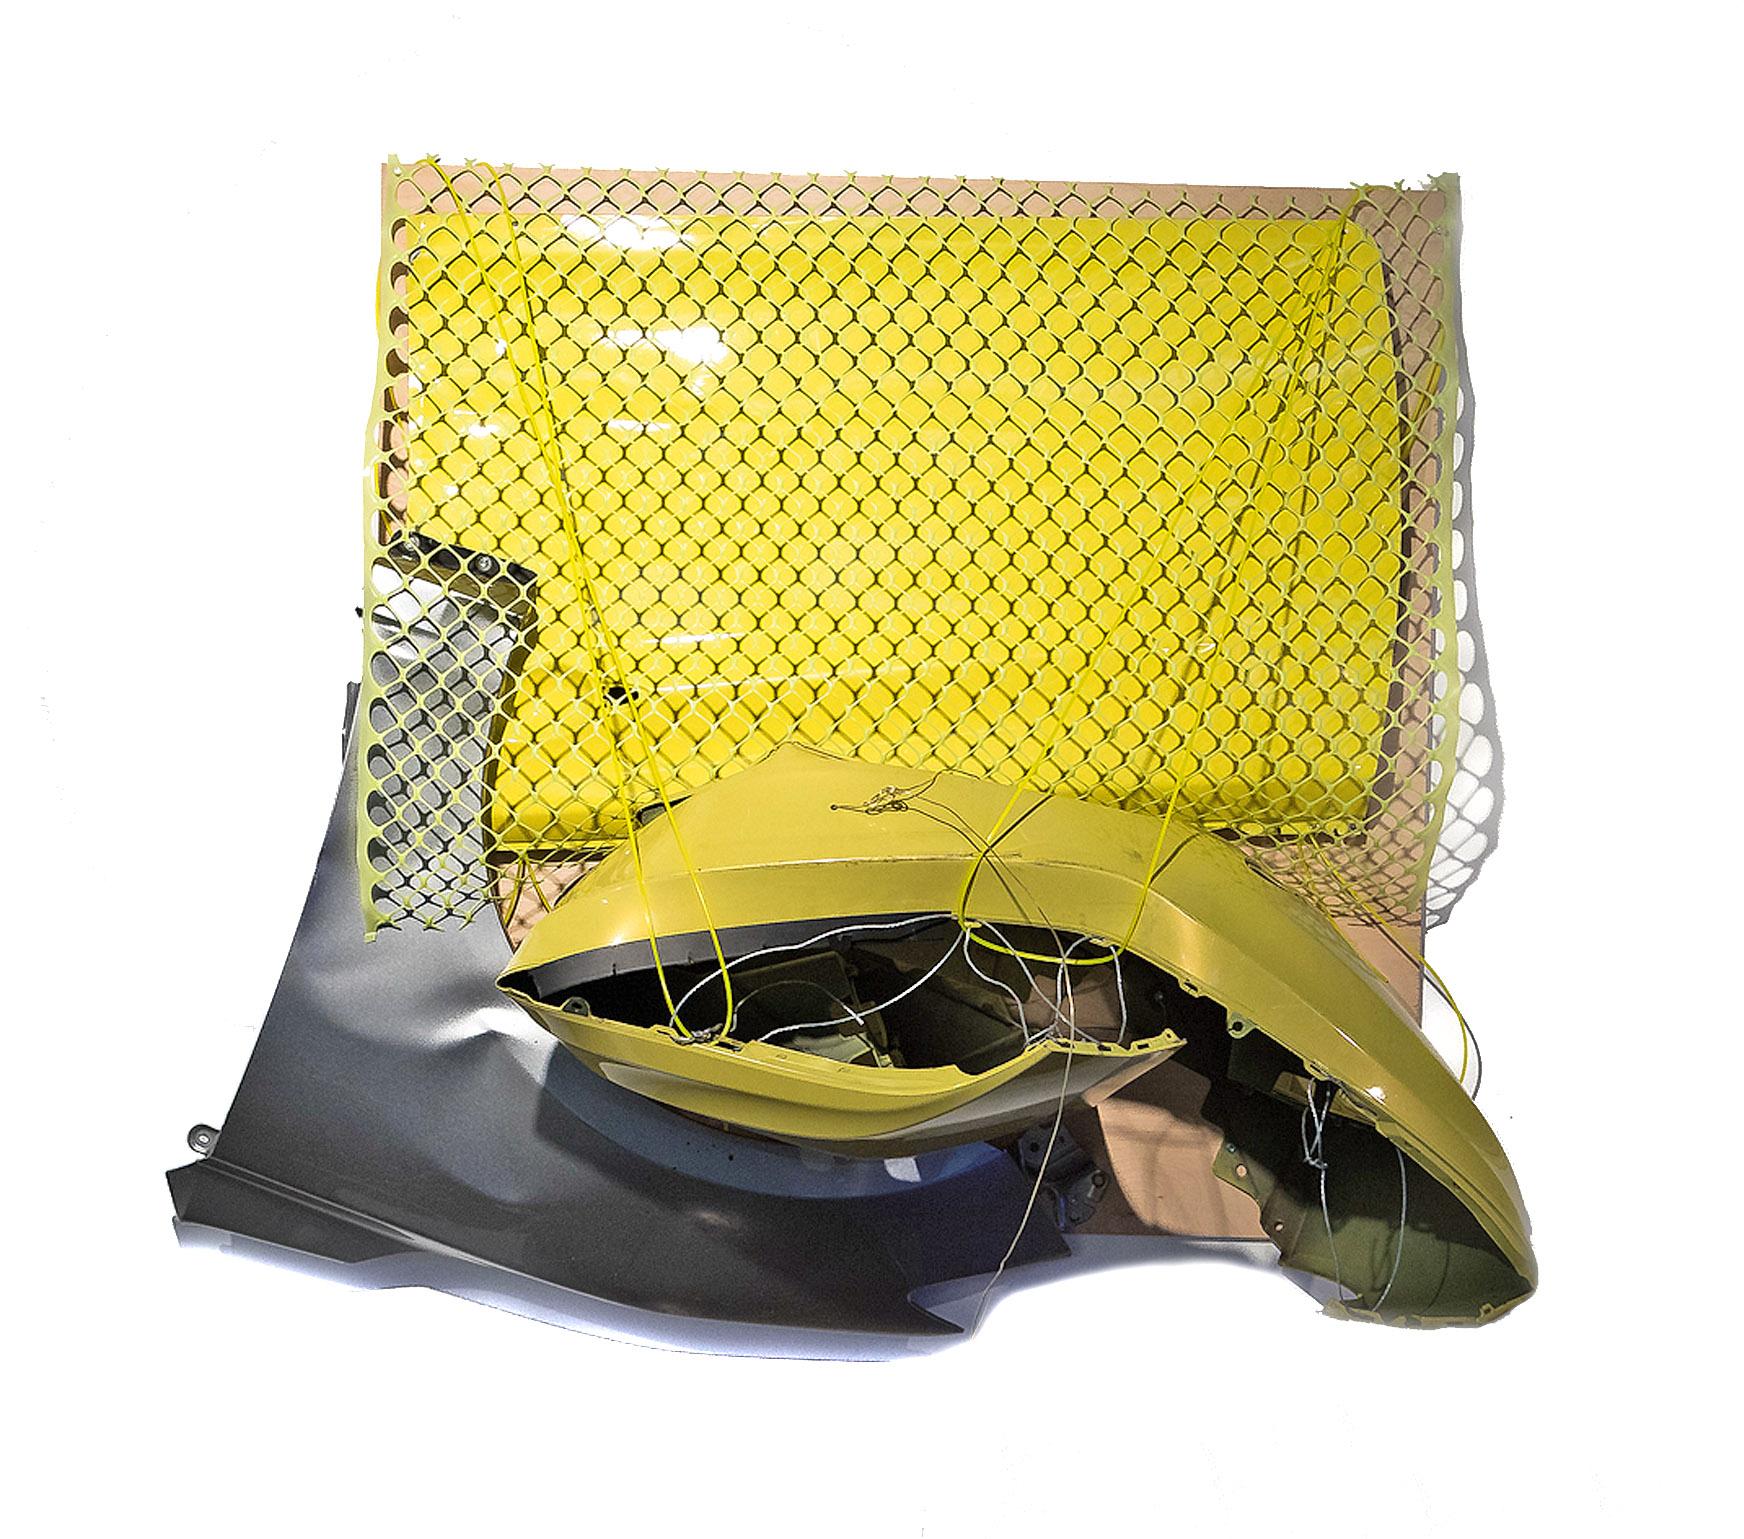 "Brooklyn   Jean Jinho Kim  Auto parts, cable, wire, mesh, wooden board  59"" x 52"" x 21""  $4,800   Click here to Inquire"